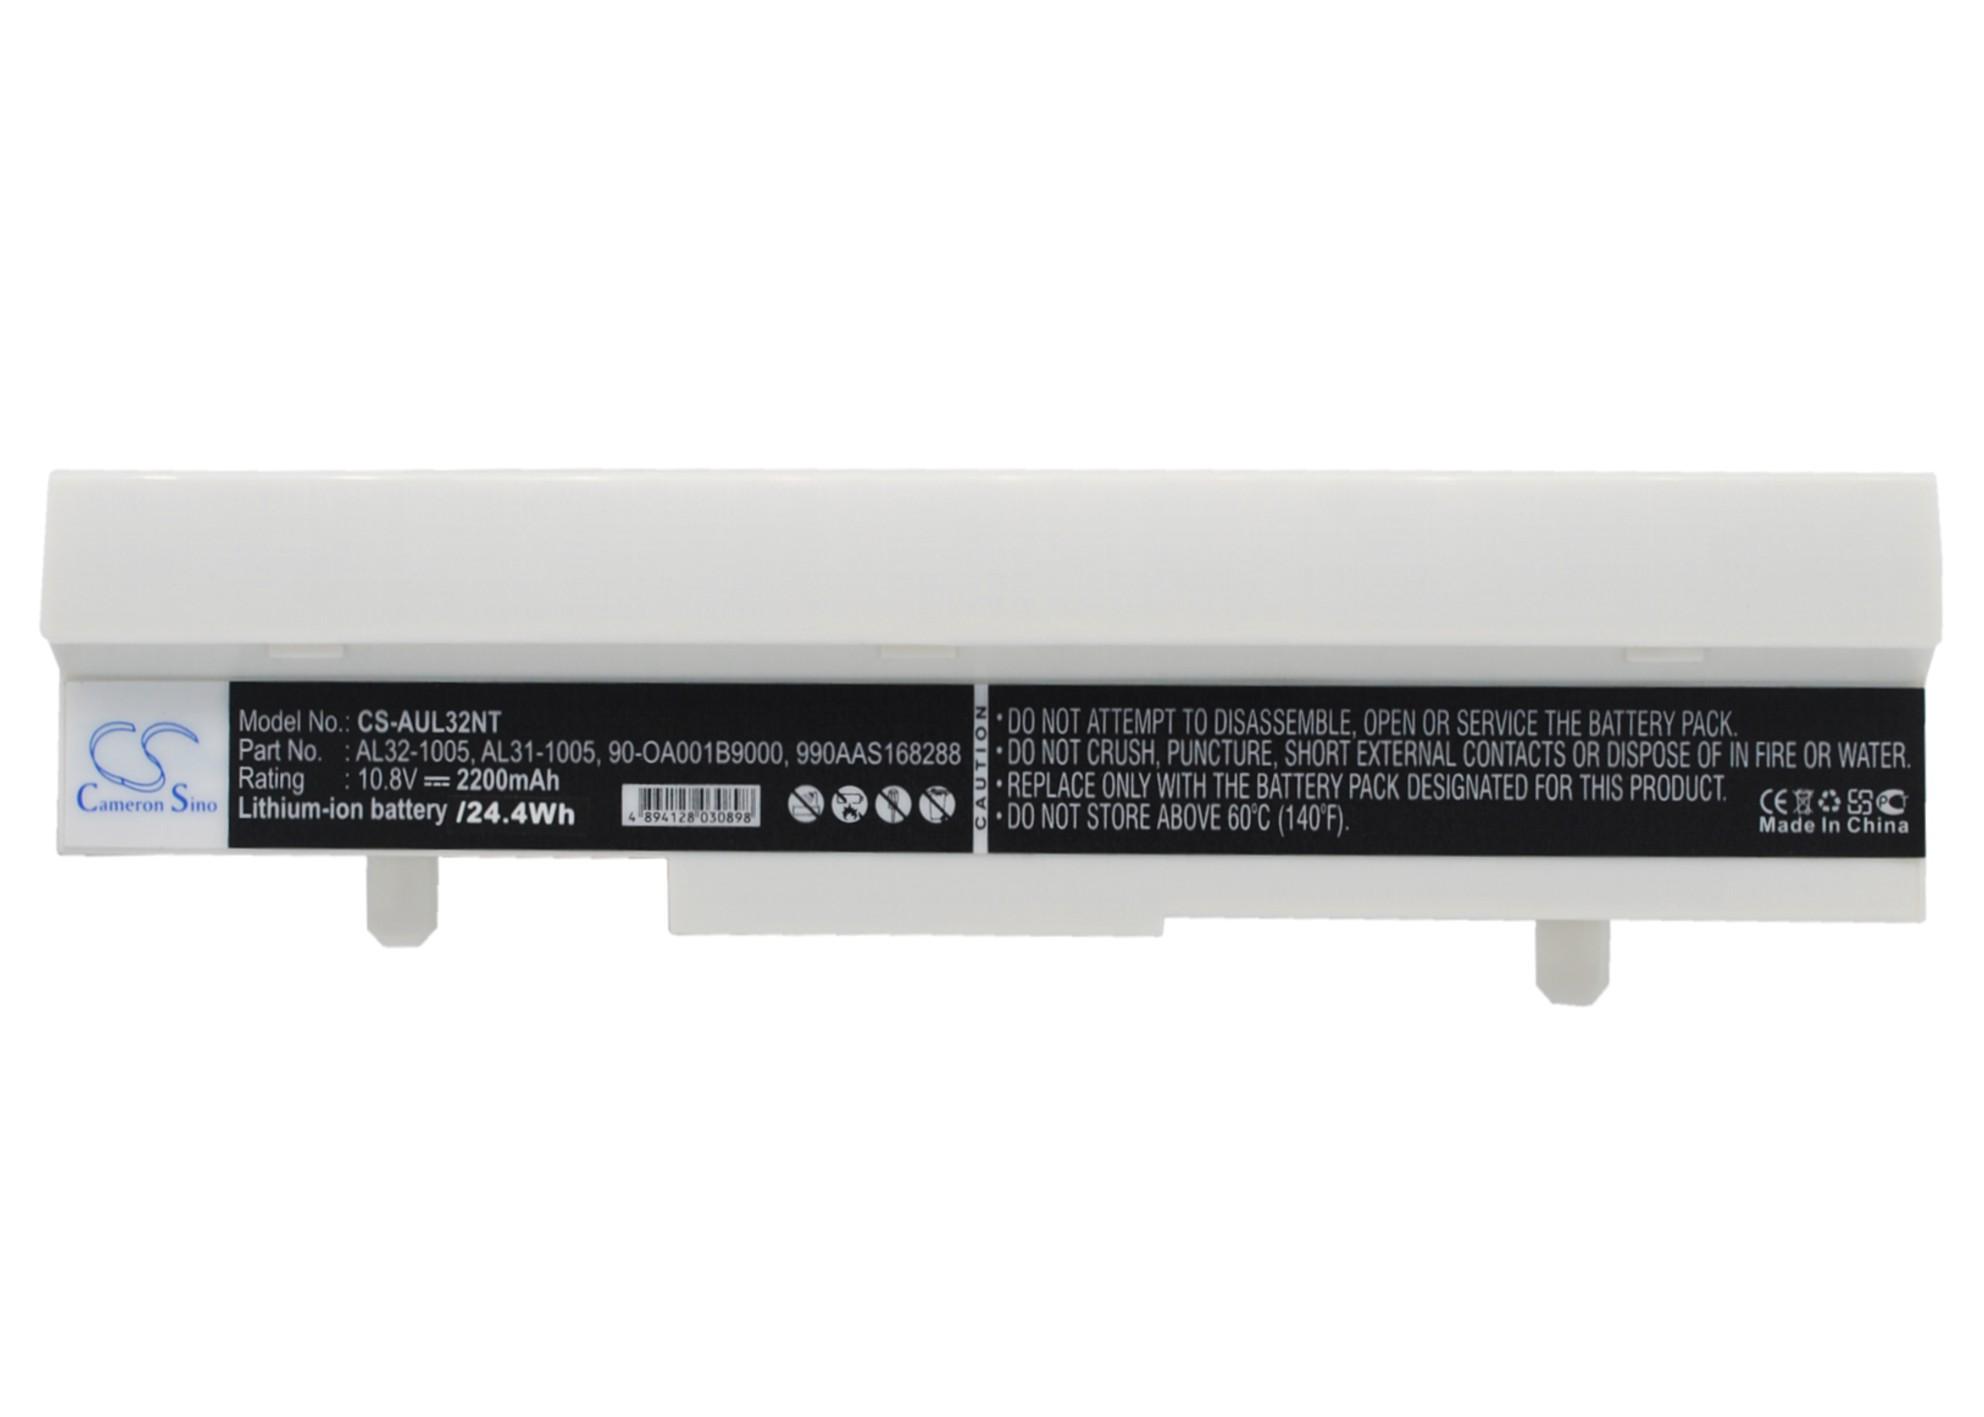 Cameron Sino baterie do netbooků pro ASUS Eee PC 1005PE-P 10.8V Li-ion 2200mAh bílá - neoriginální